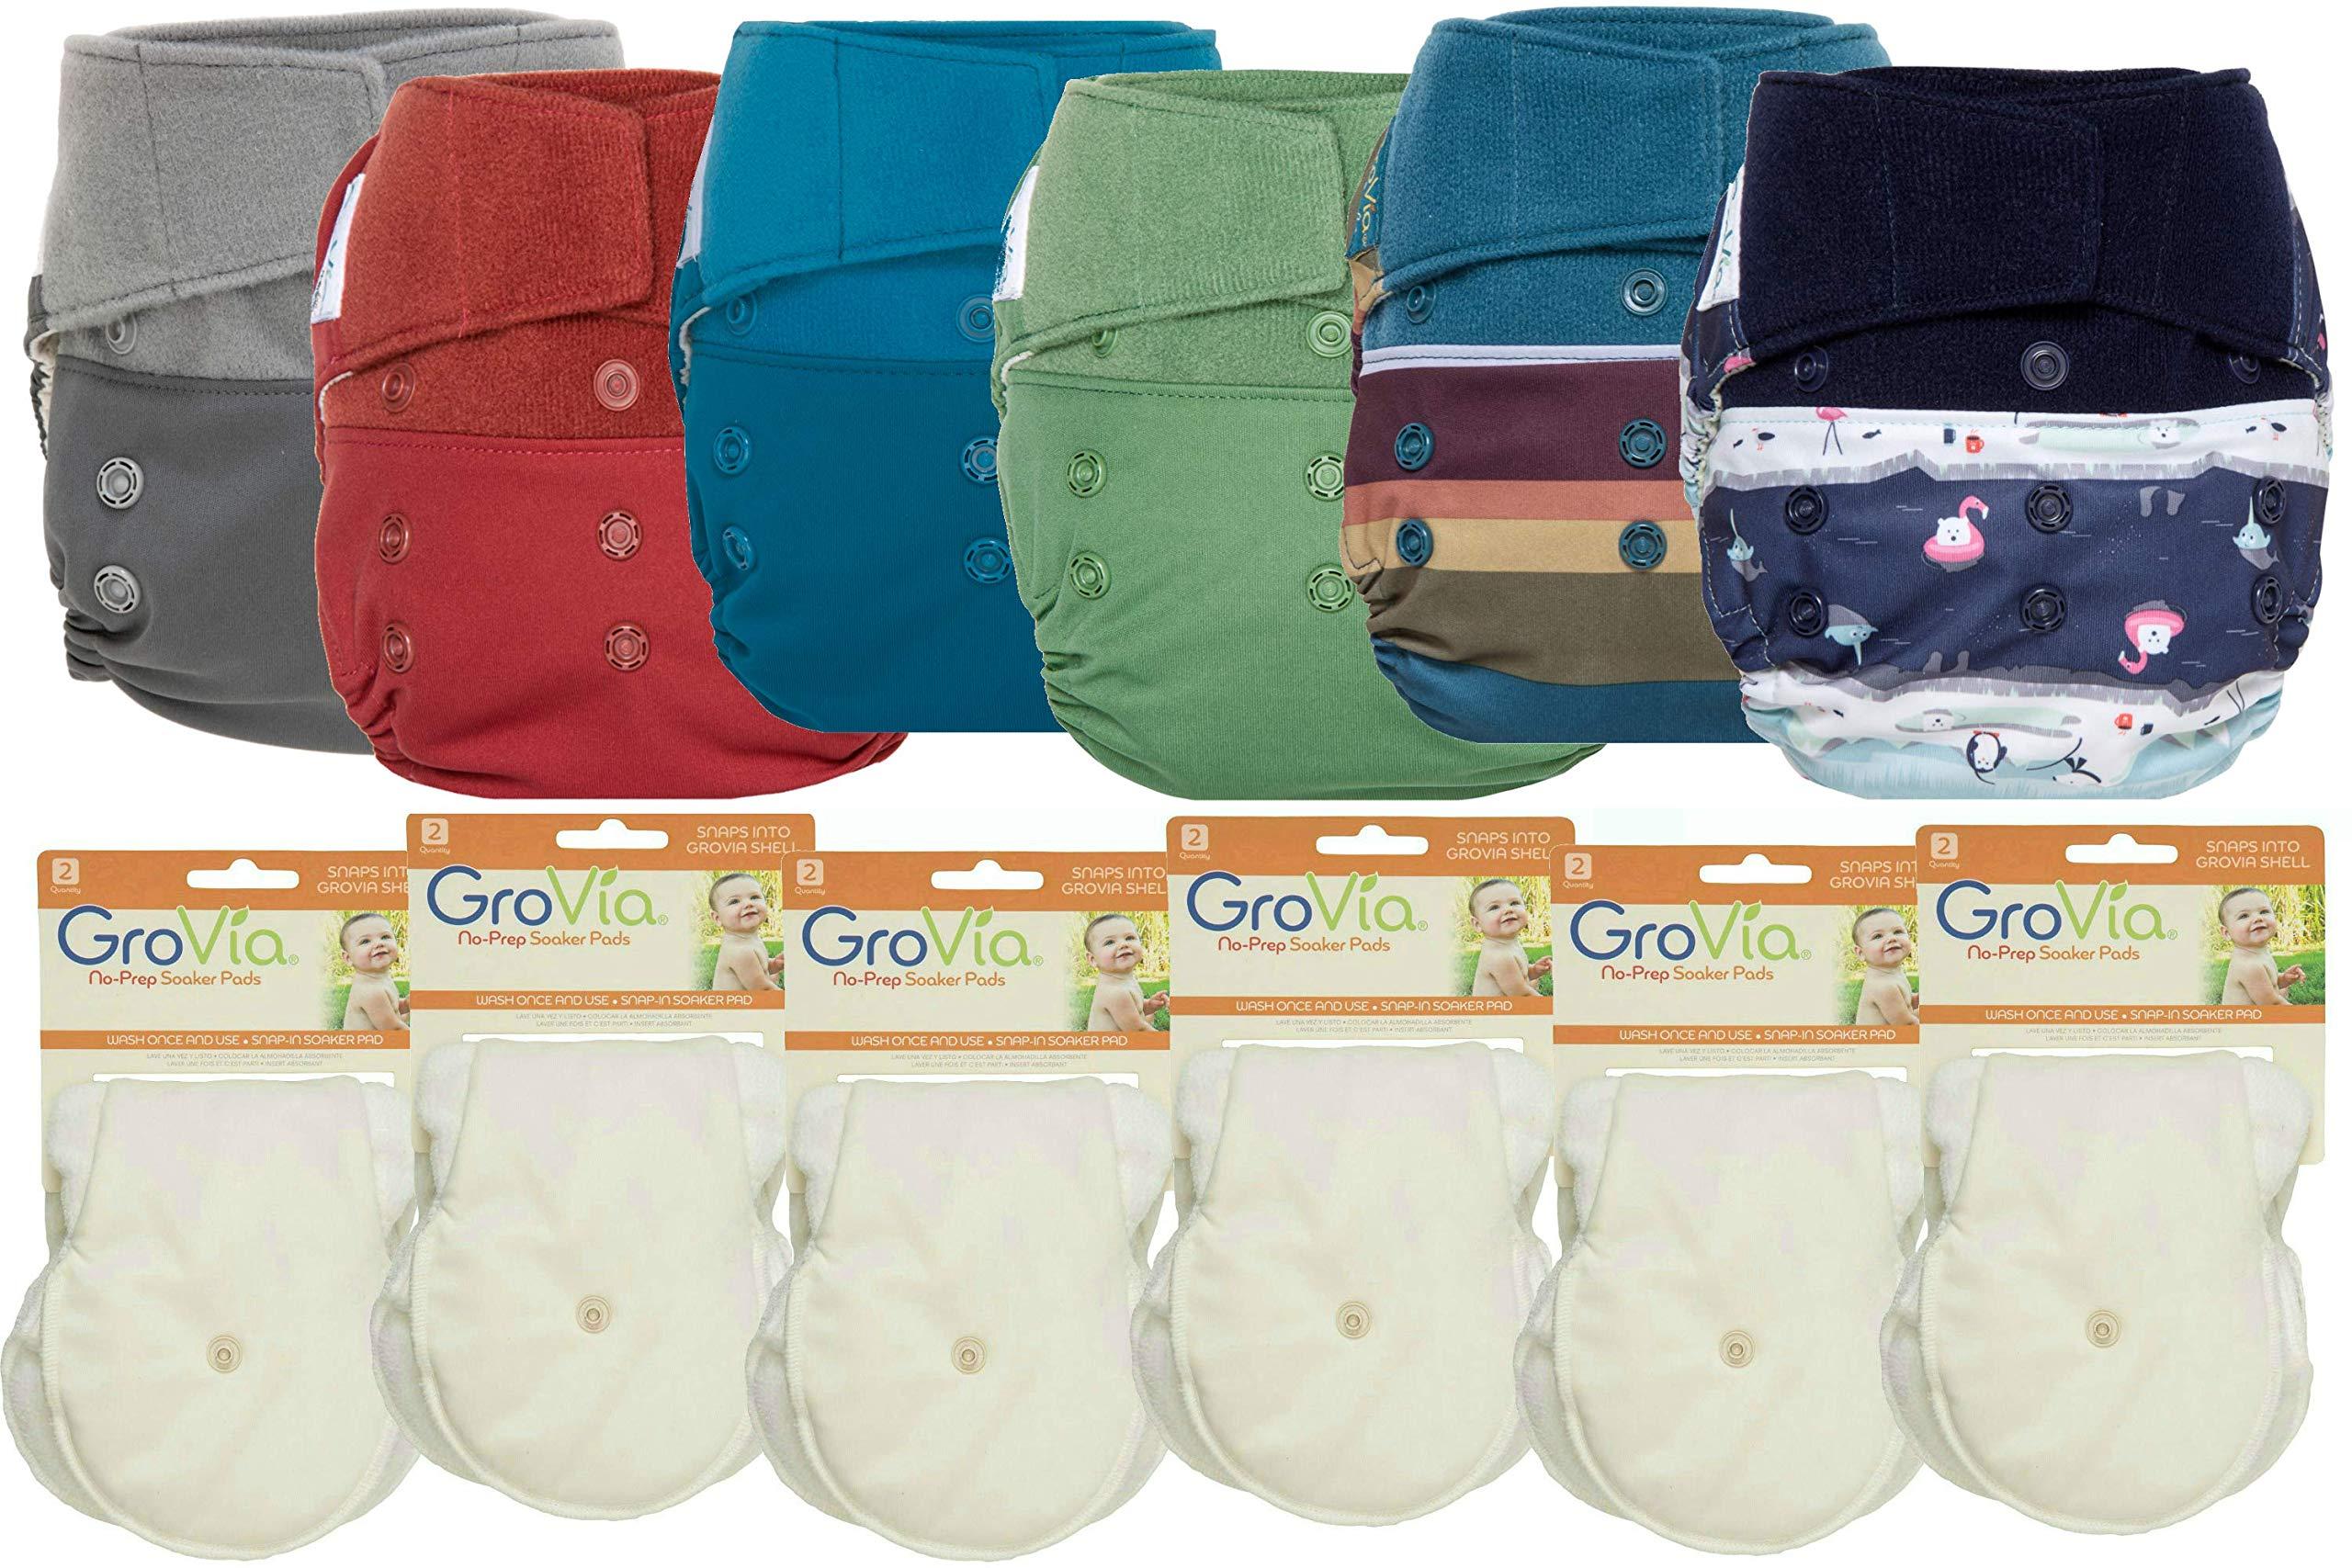 GroVia Hybrid Part Time Package: 6 Shells + 12 No Prep Soaker Pads (Color Mix 1 - Hook & Loop)